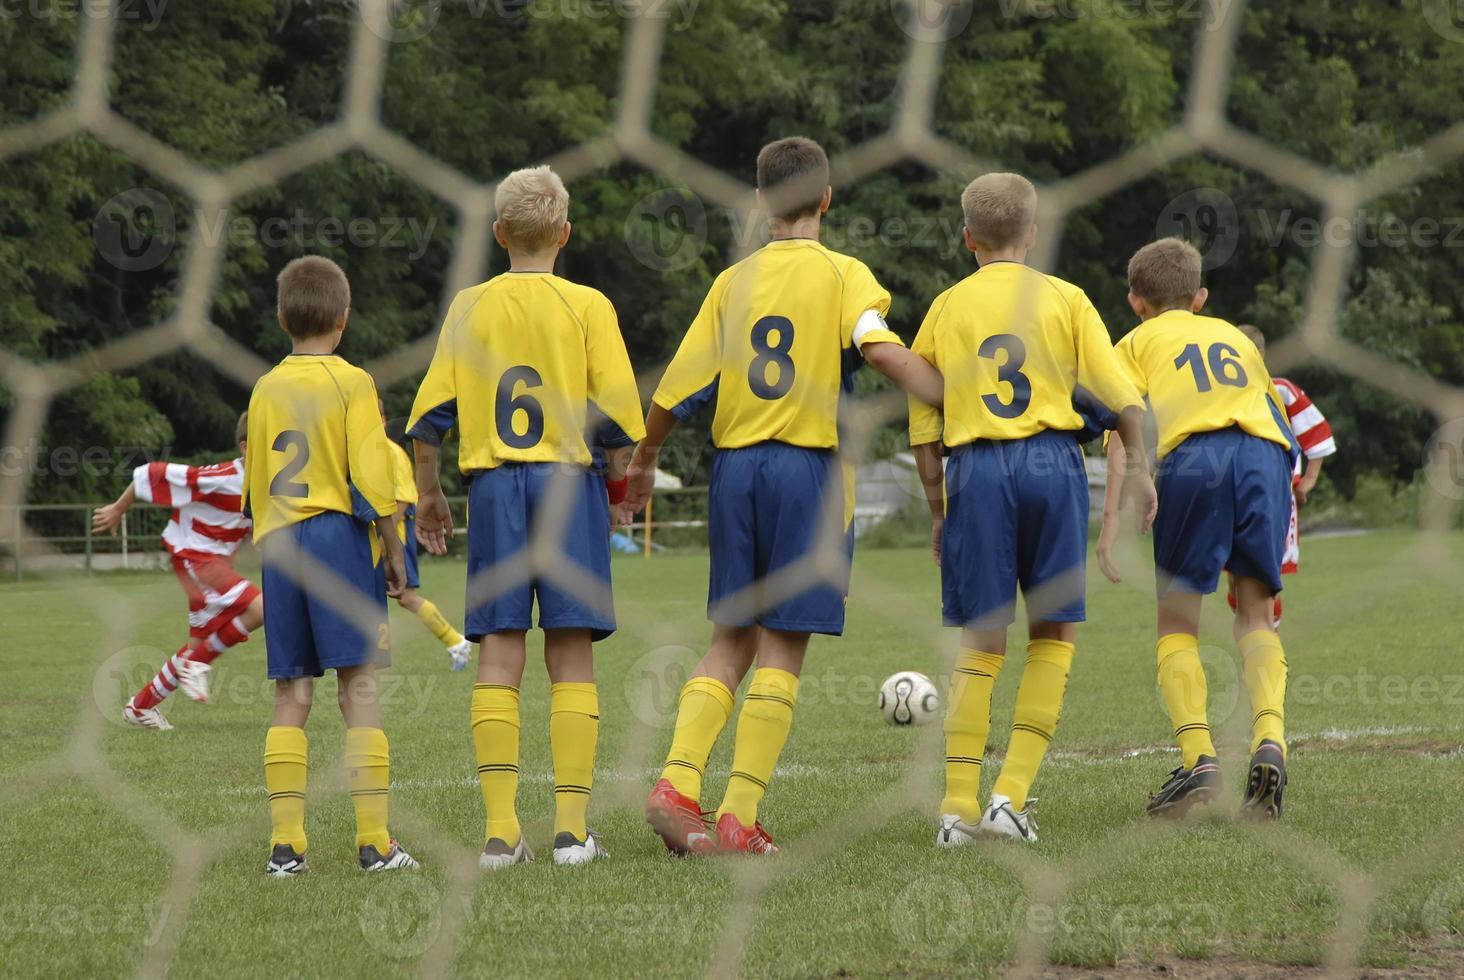 blockering i fotbollsmatch foto